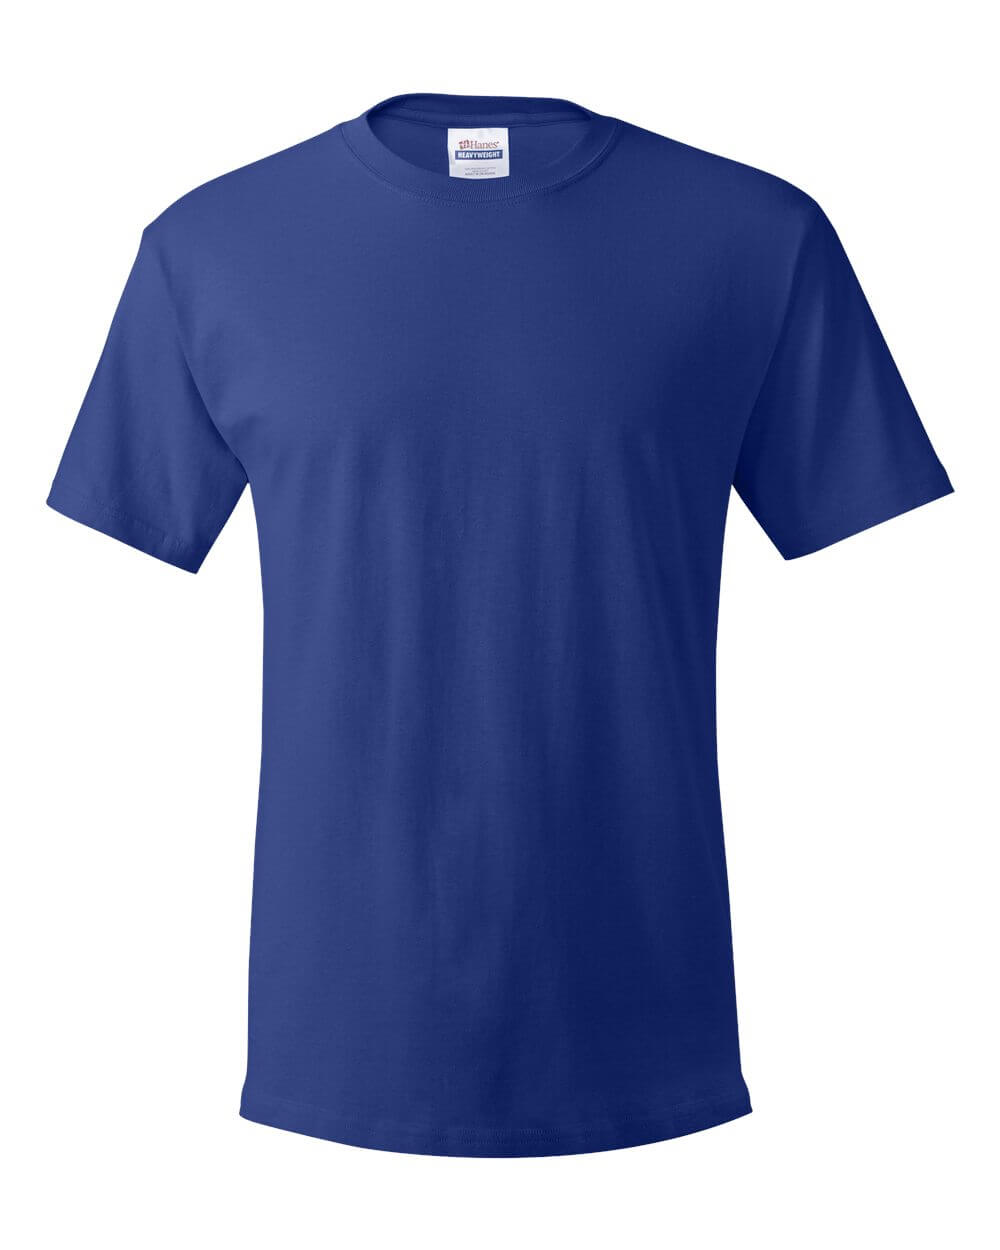 Hanes_5280_Deep_Royal Blue Custom T Shirts